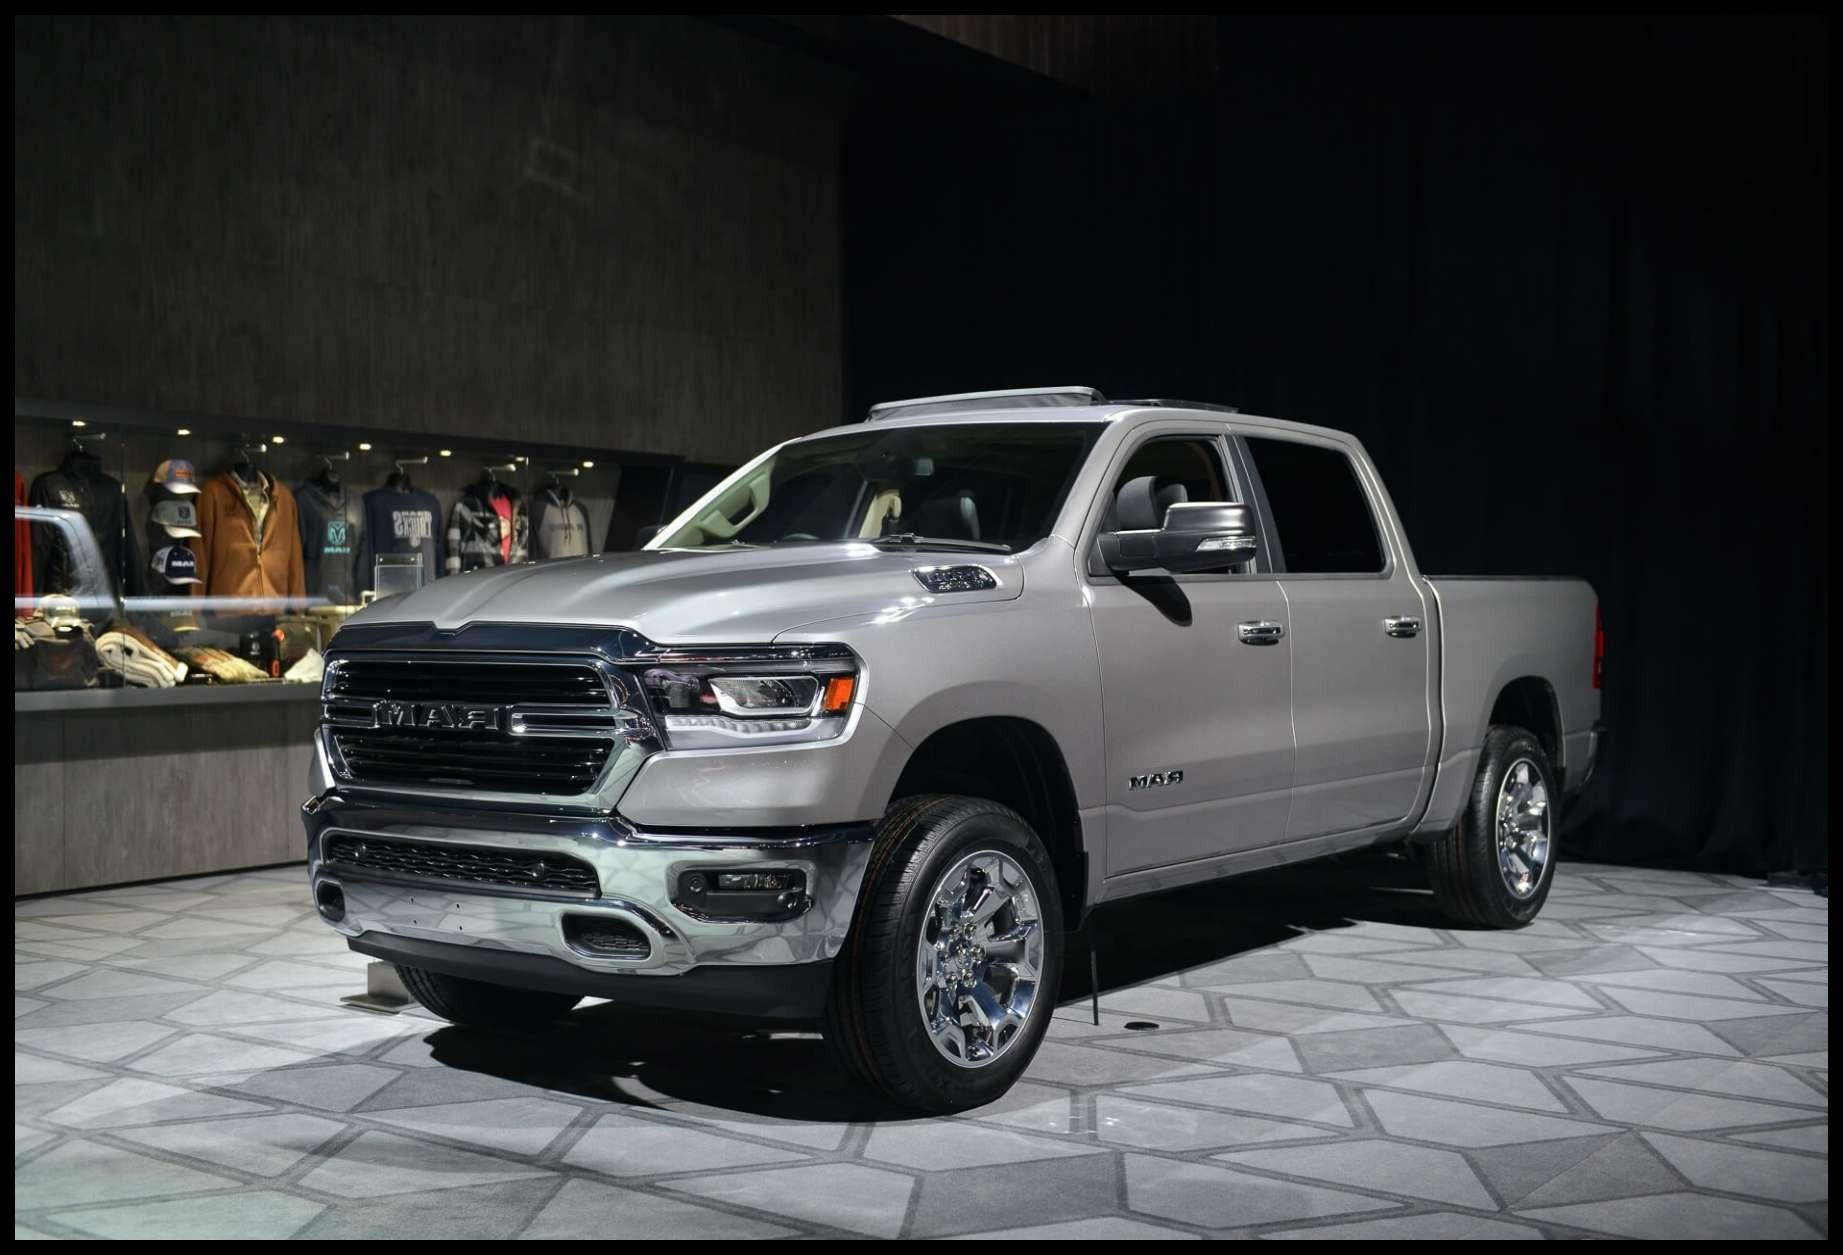 2020 toyota Hilux Interior 2020 Dodge 1500 Color 2020 toyota Hilux 2014 toyota Hilux 3 0d